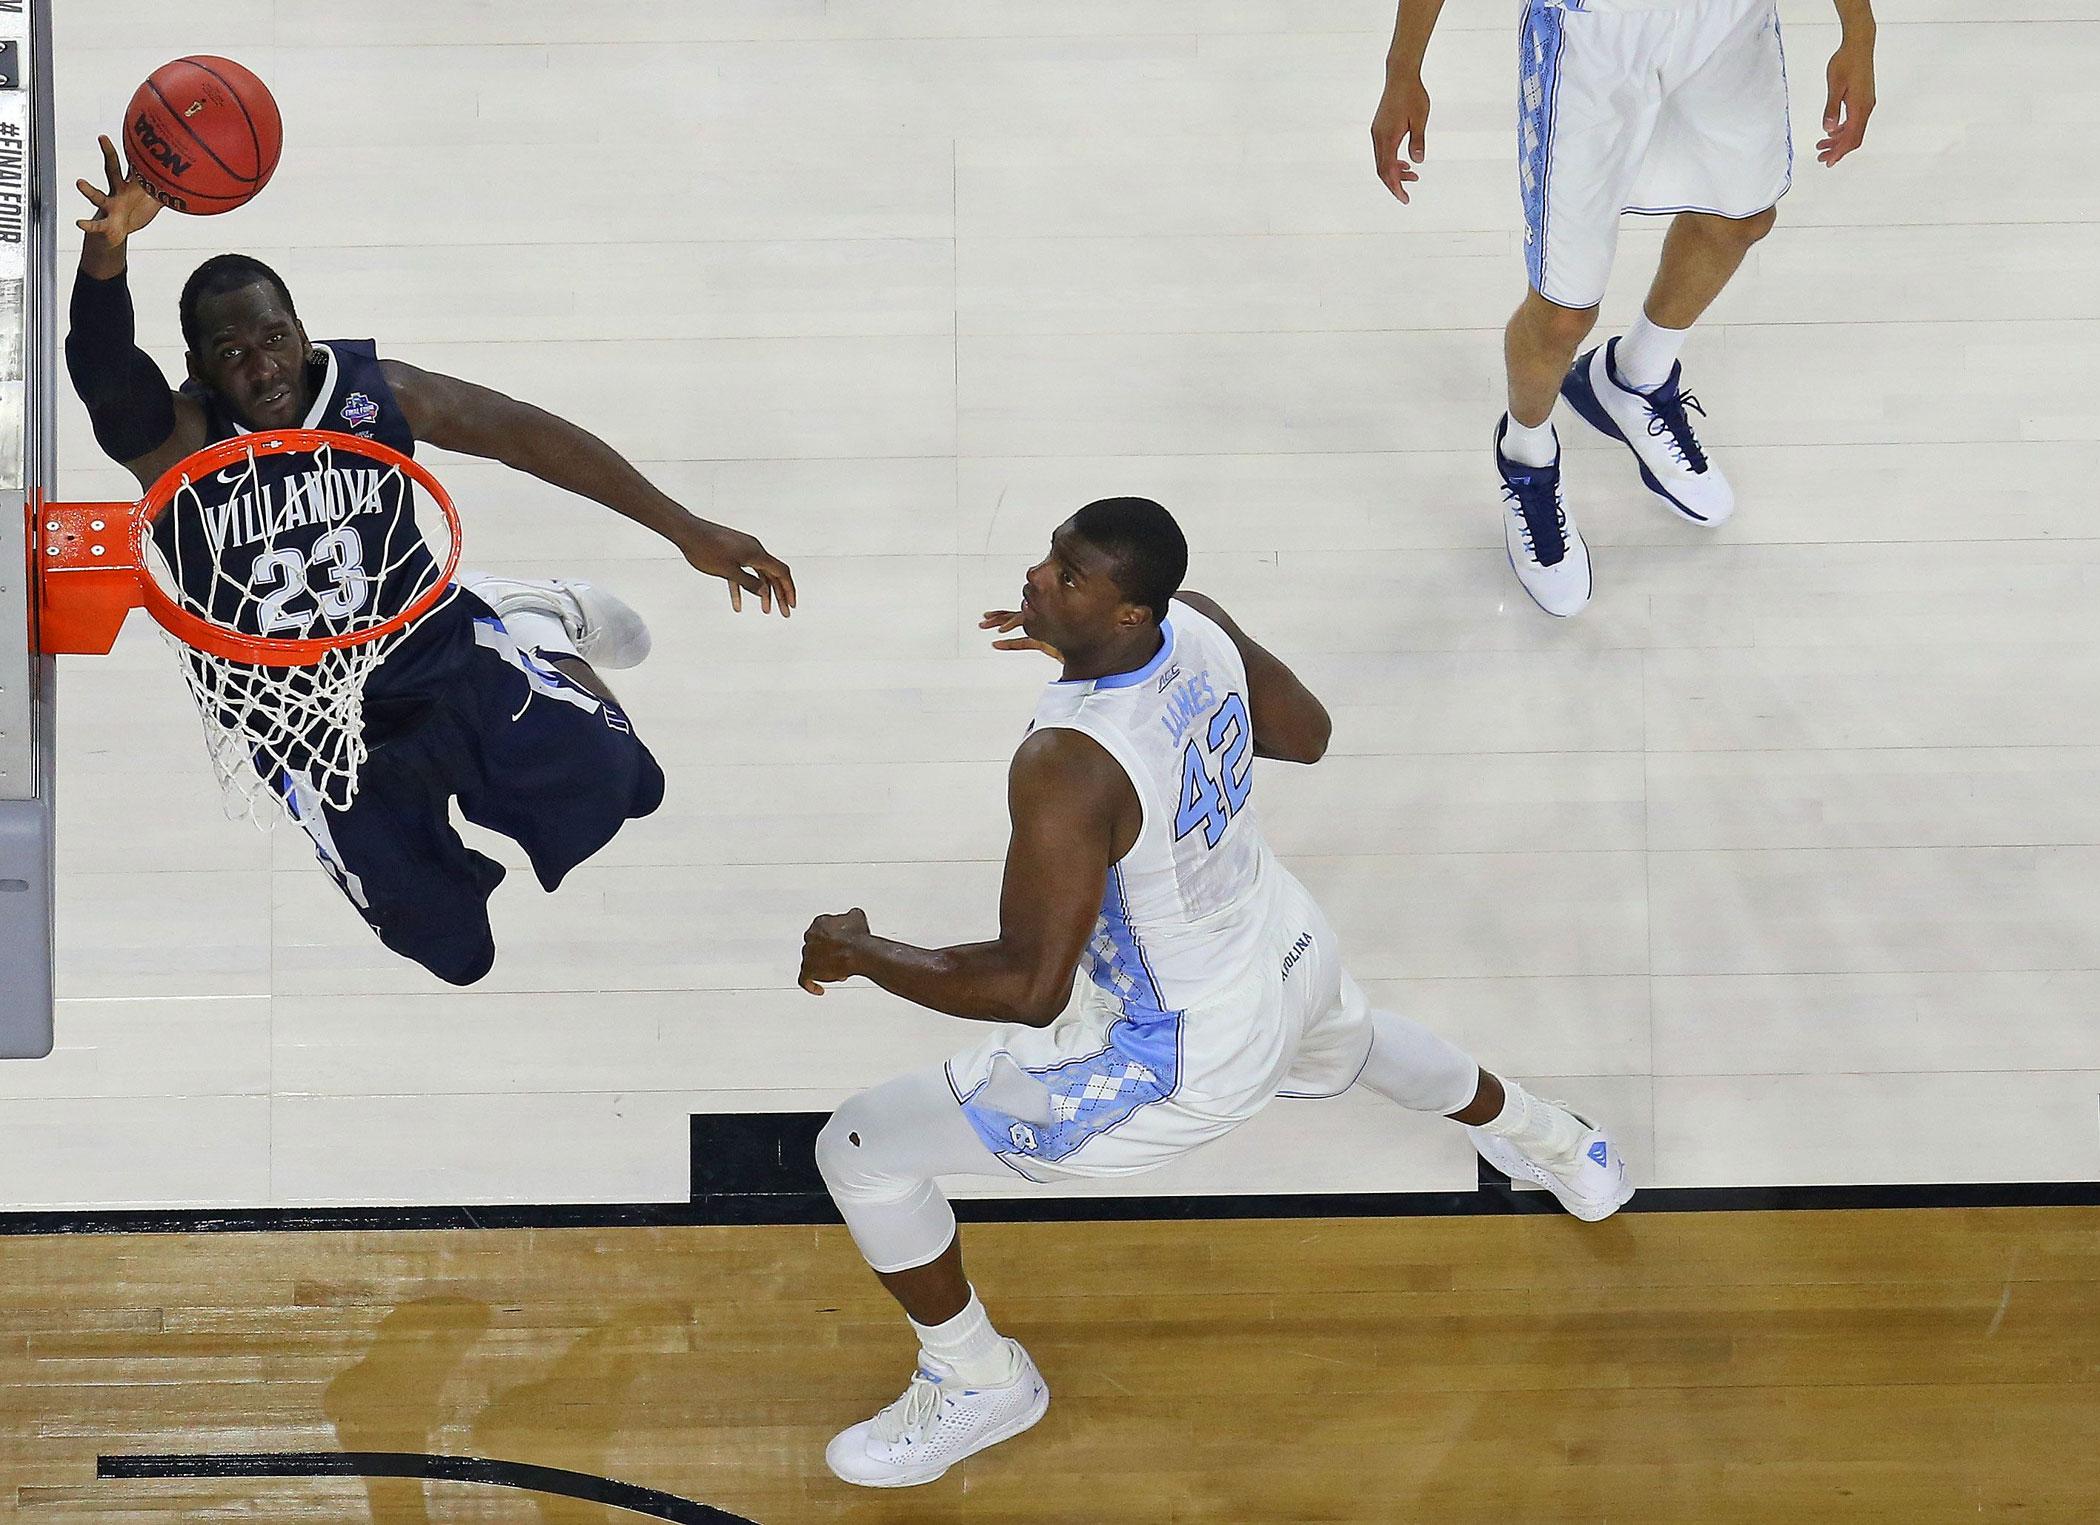 Villanova Wildcats Daniel Ochefu (23) lays up the ball up against North Carolina Tar Heels' Joel James (42) during the NCAA college basketball National Championship  game on April 4, 2016 in Houston.